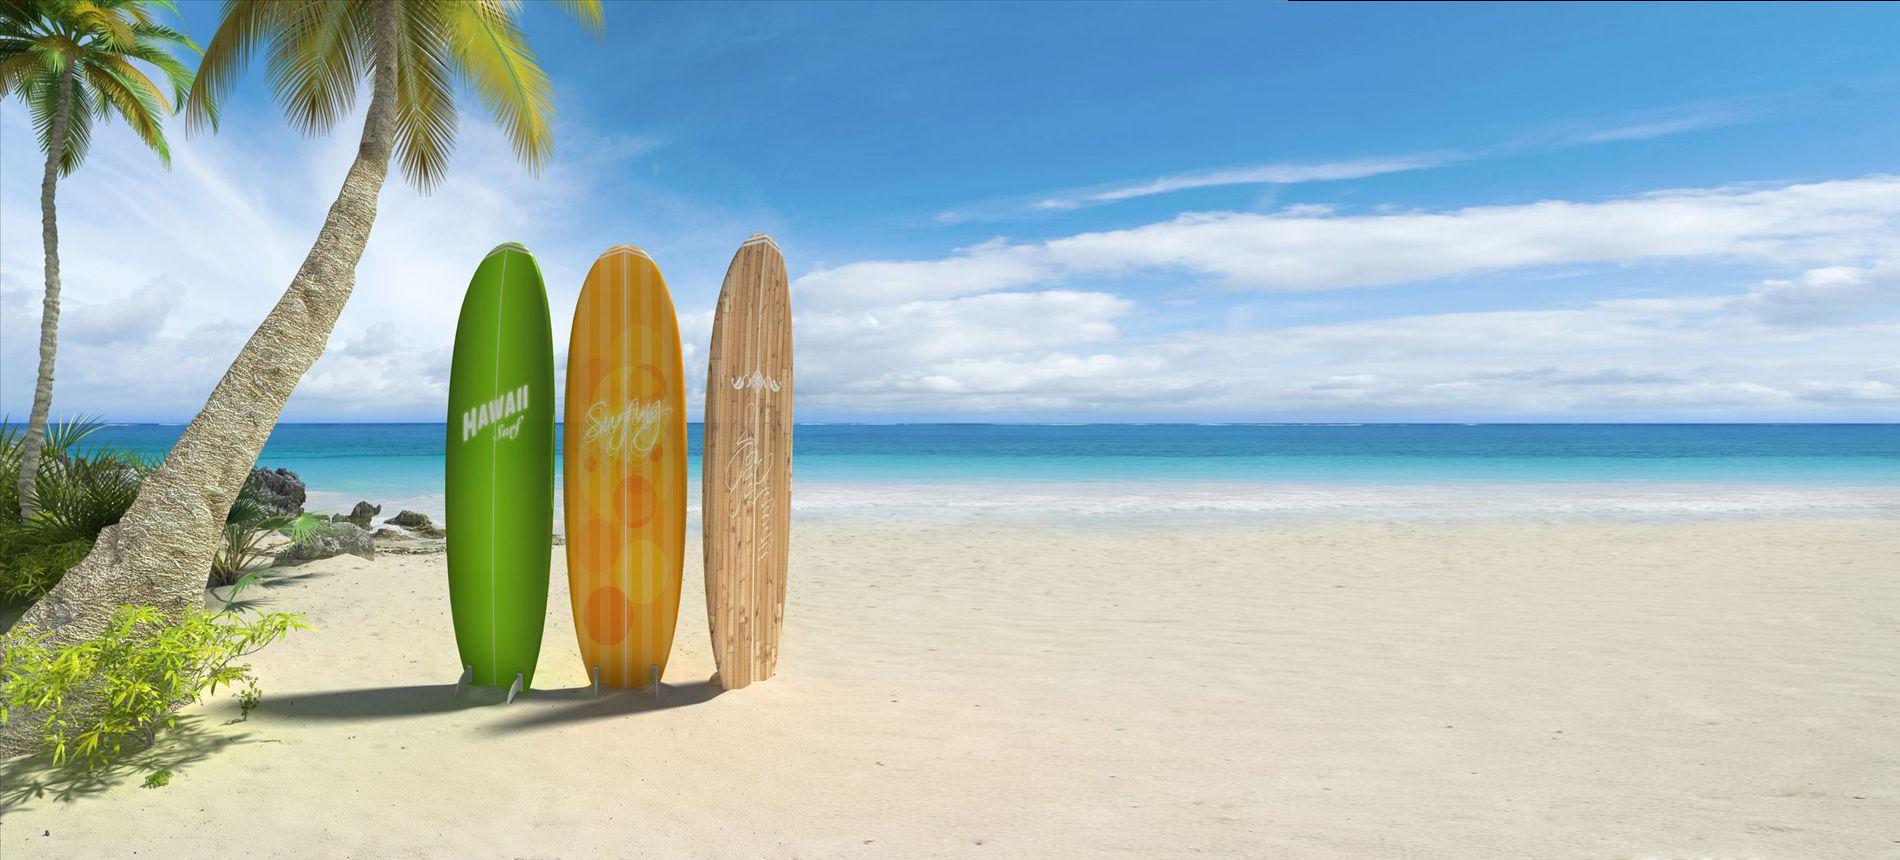 Best Free Photo Editing Software - PHOTO POS PRO V 3.0